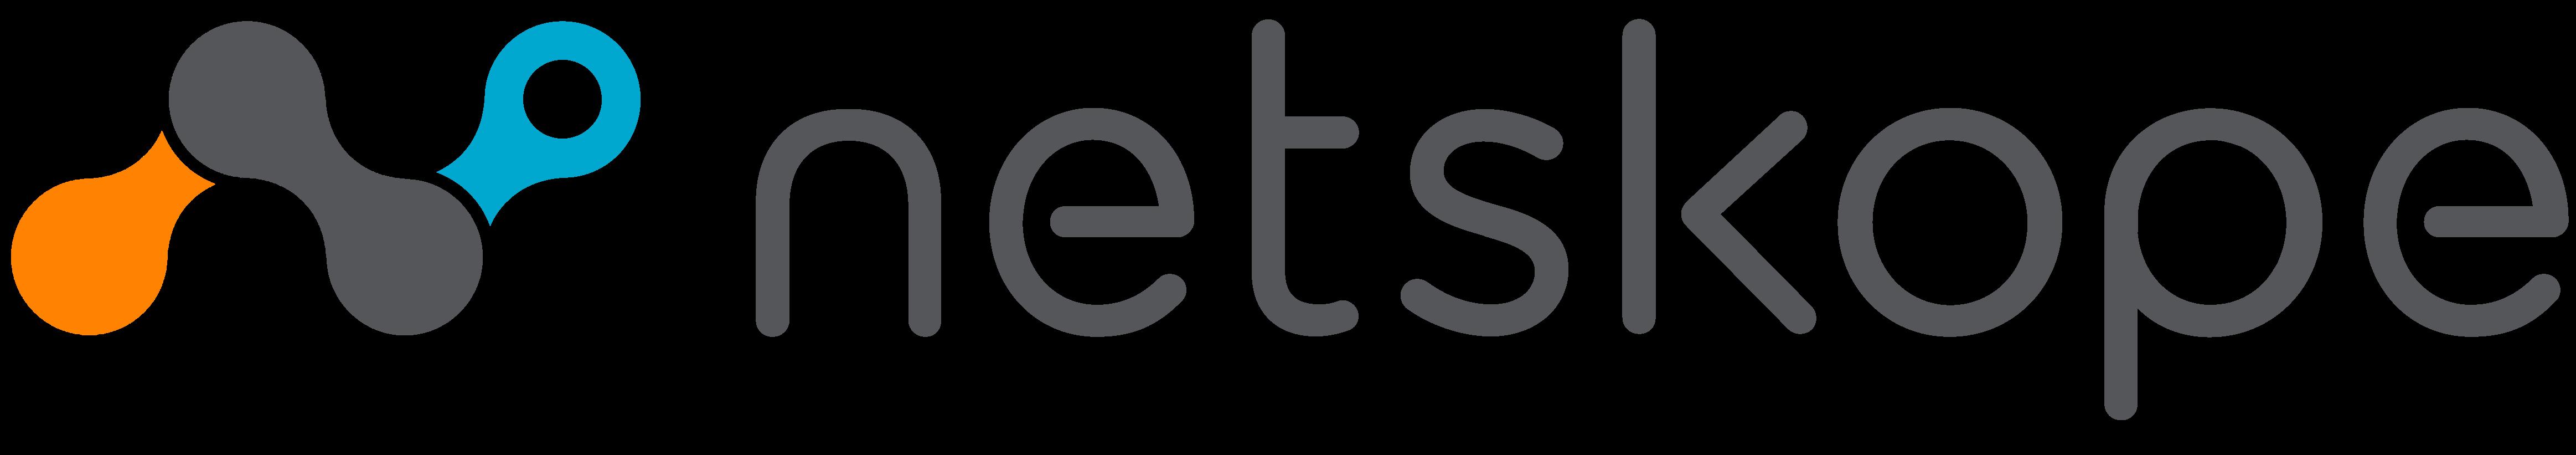 Stensu logo